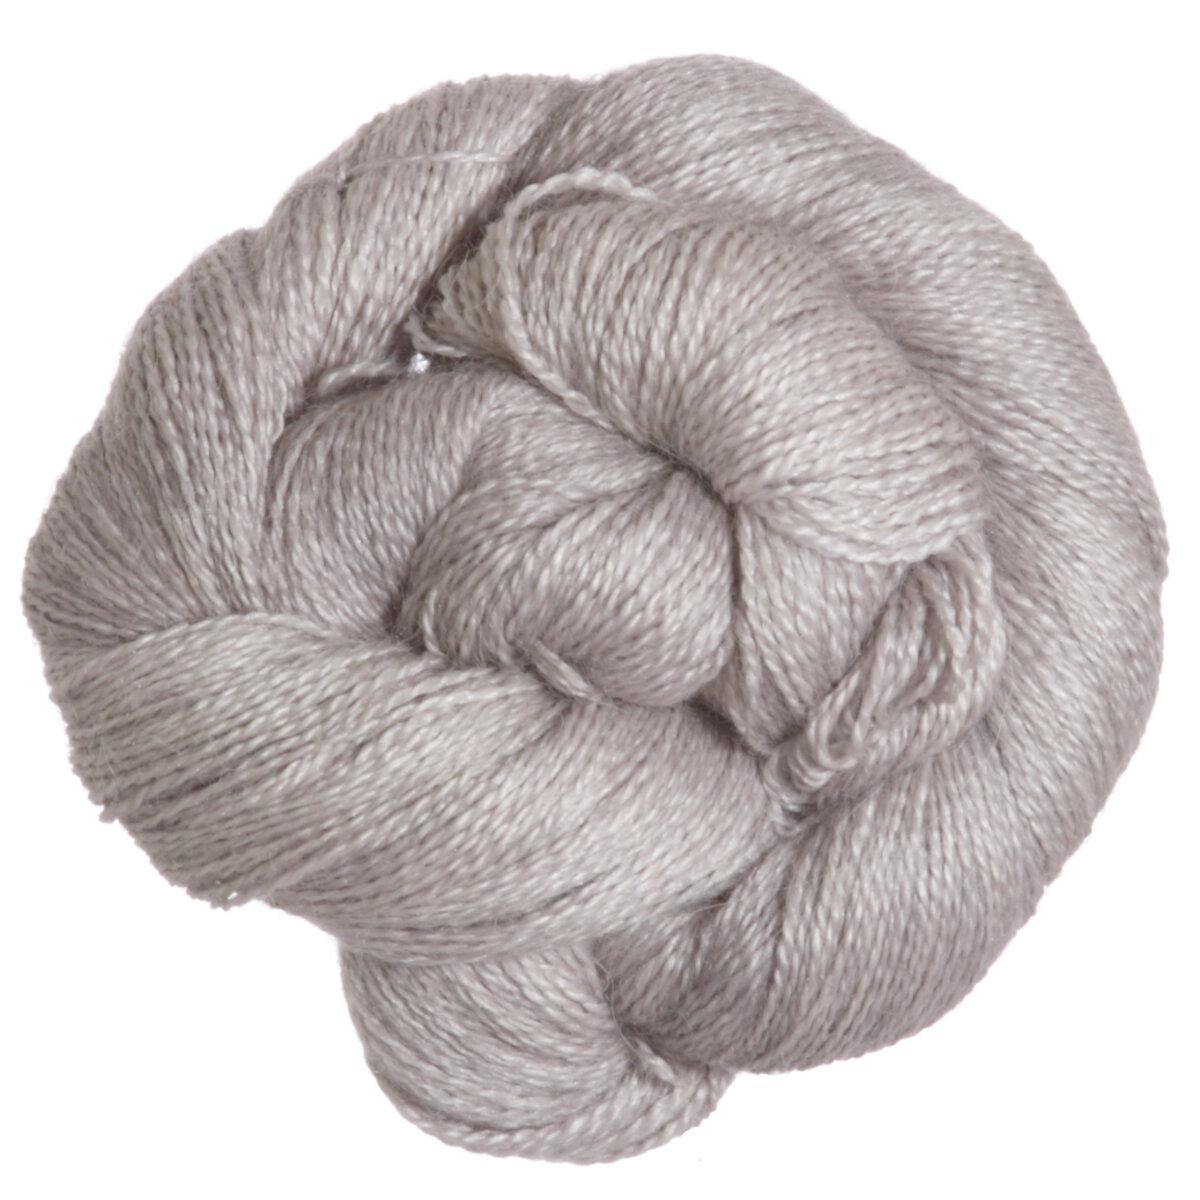 611 Malabrigo Silkpaca Lace Alpaca Silk Knitting Yarn Wool 50g Ravelry Red